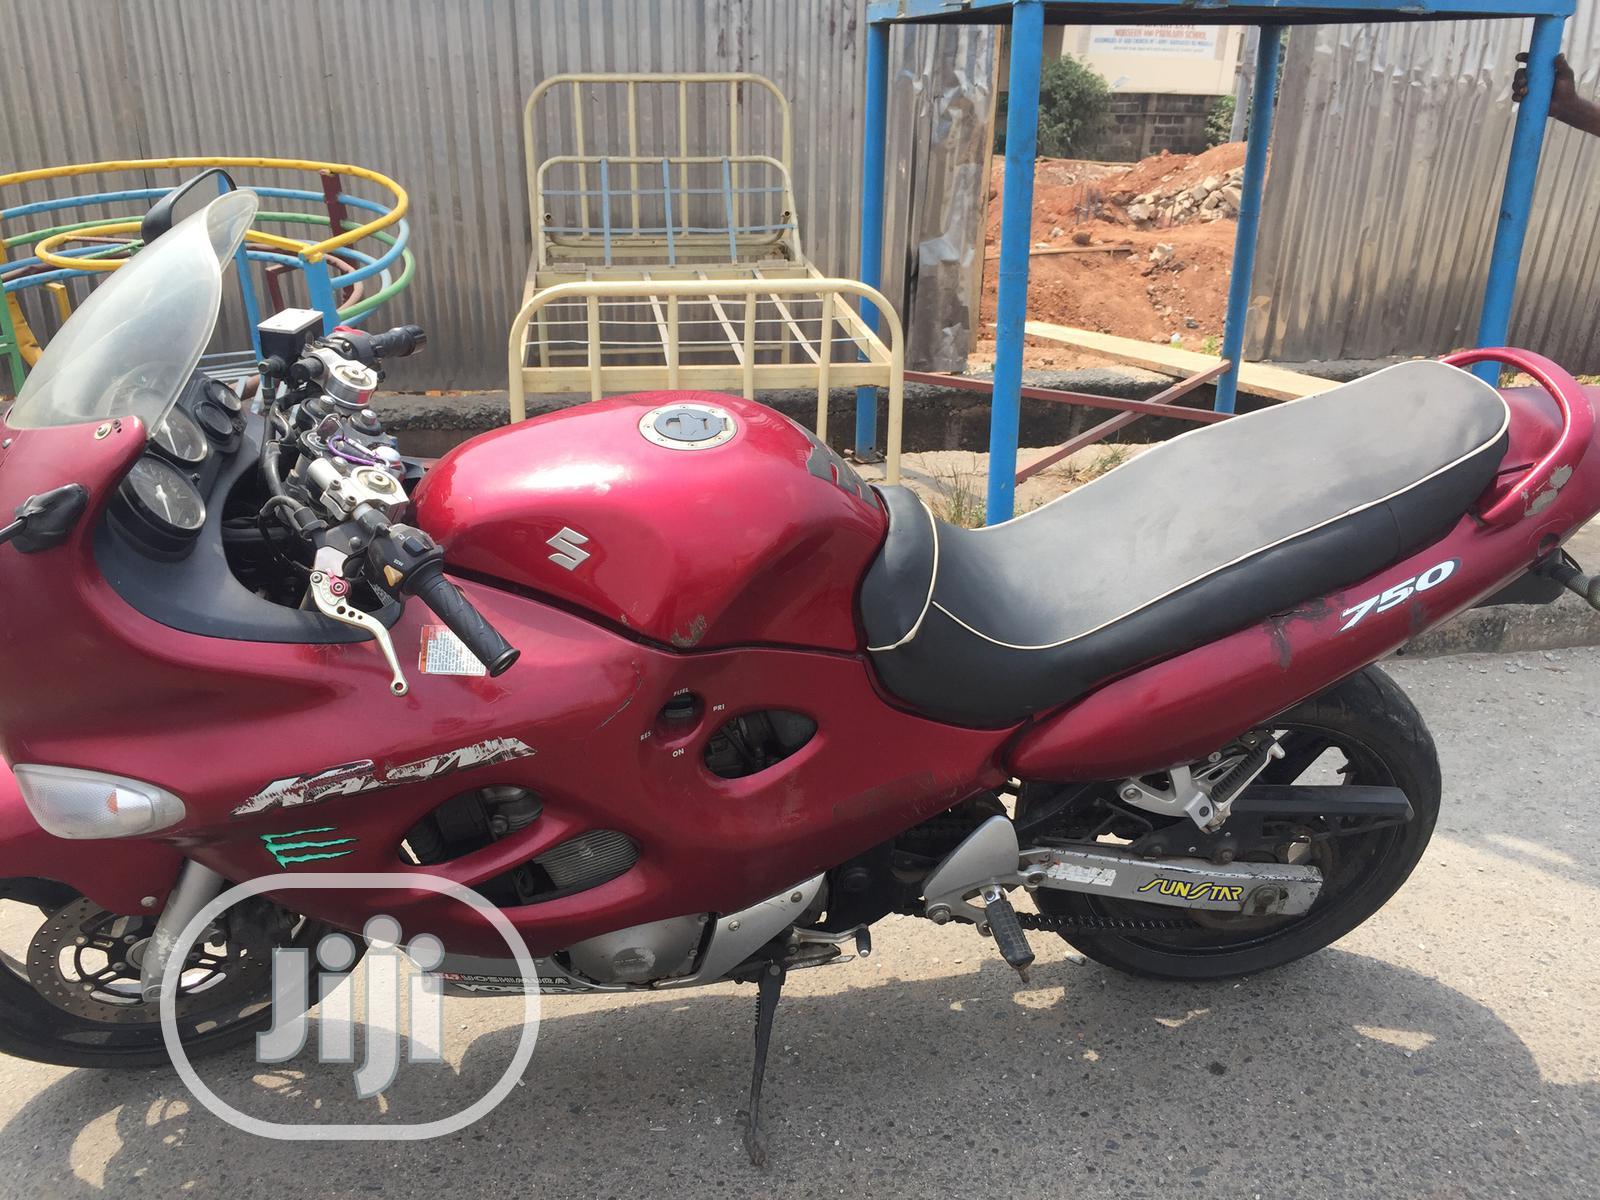 Archive: Suzuki GSX / Katana 2006 Red